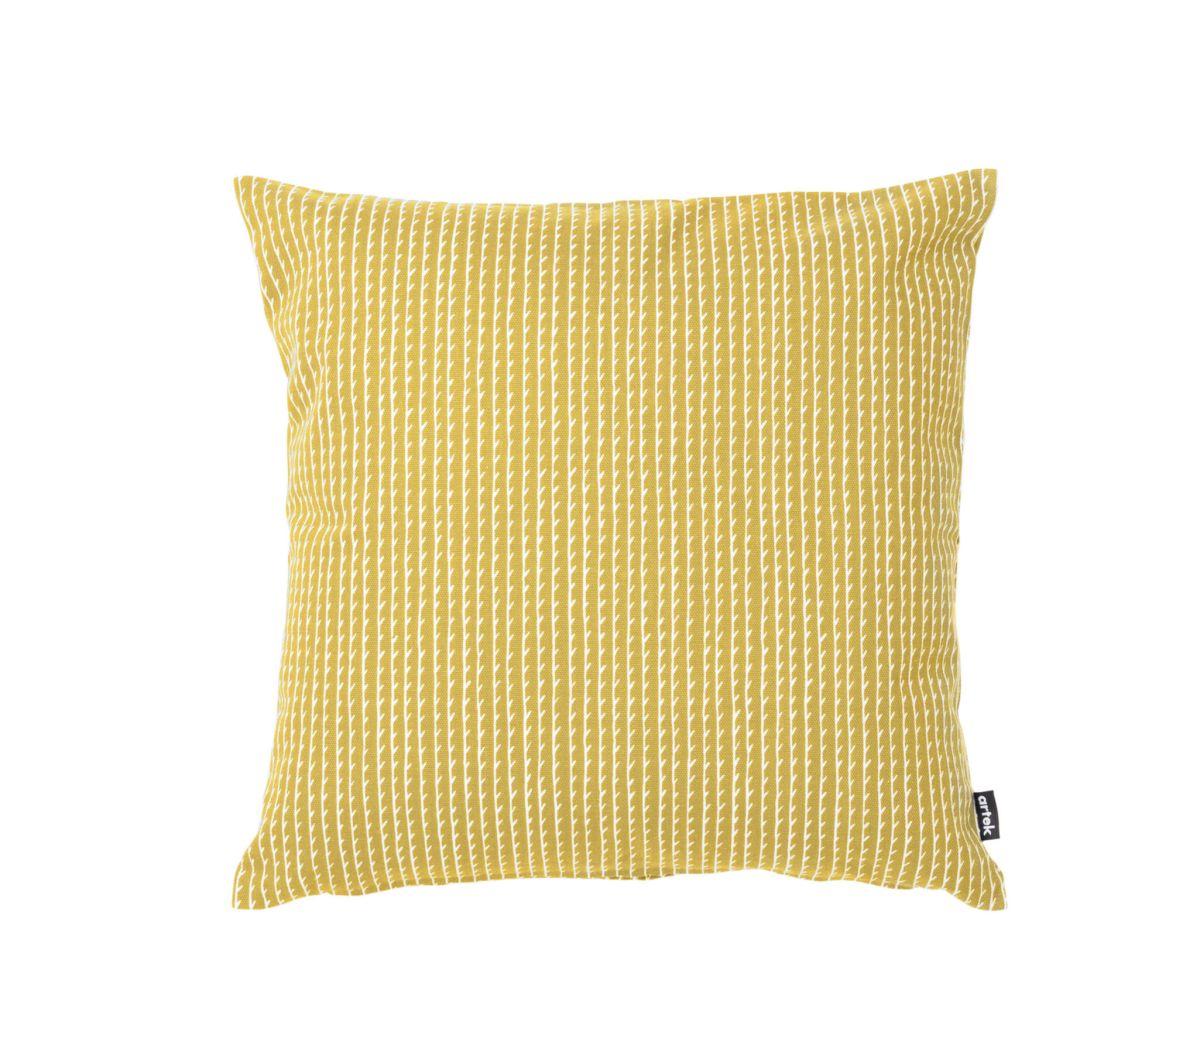 Rivi-Cushion-small-yellow_white-3869471